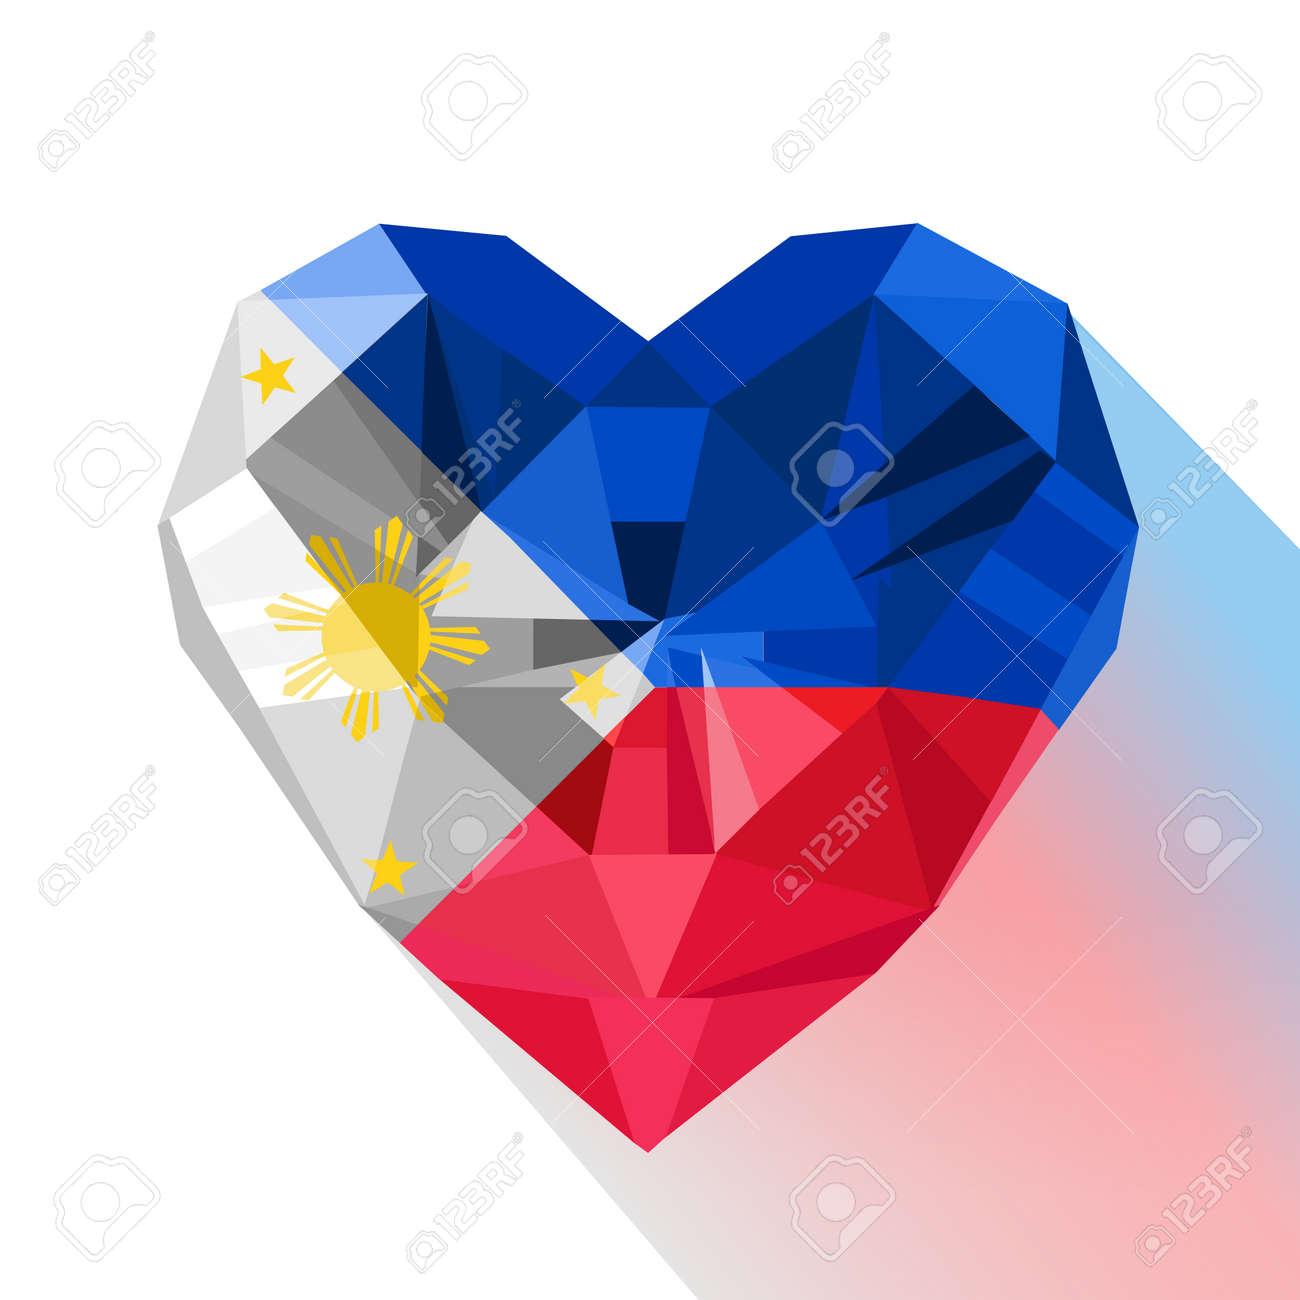 Vector crystal gem jewelry philippine heart with the flag of vector crystal gem jewelry philippine heart with the flag of the republic of the philippines biocorpaavc Choice Image